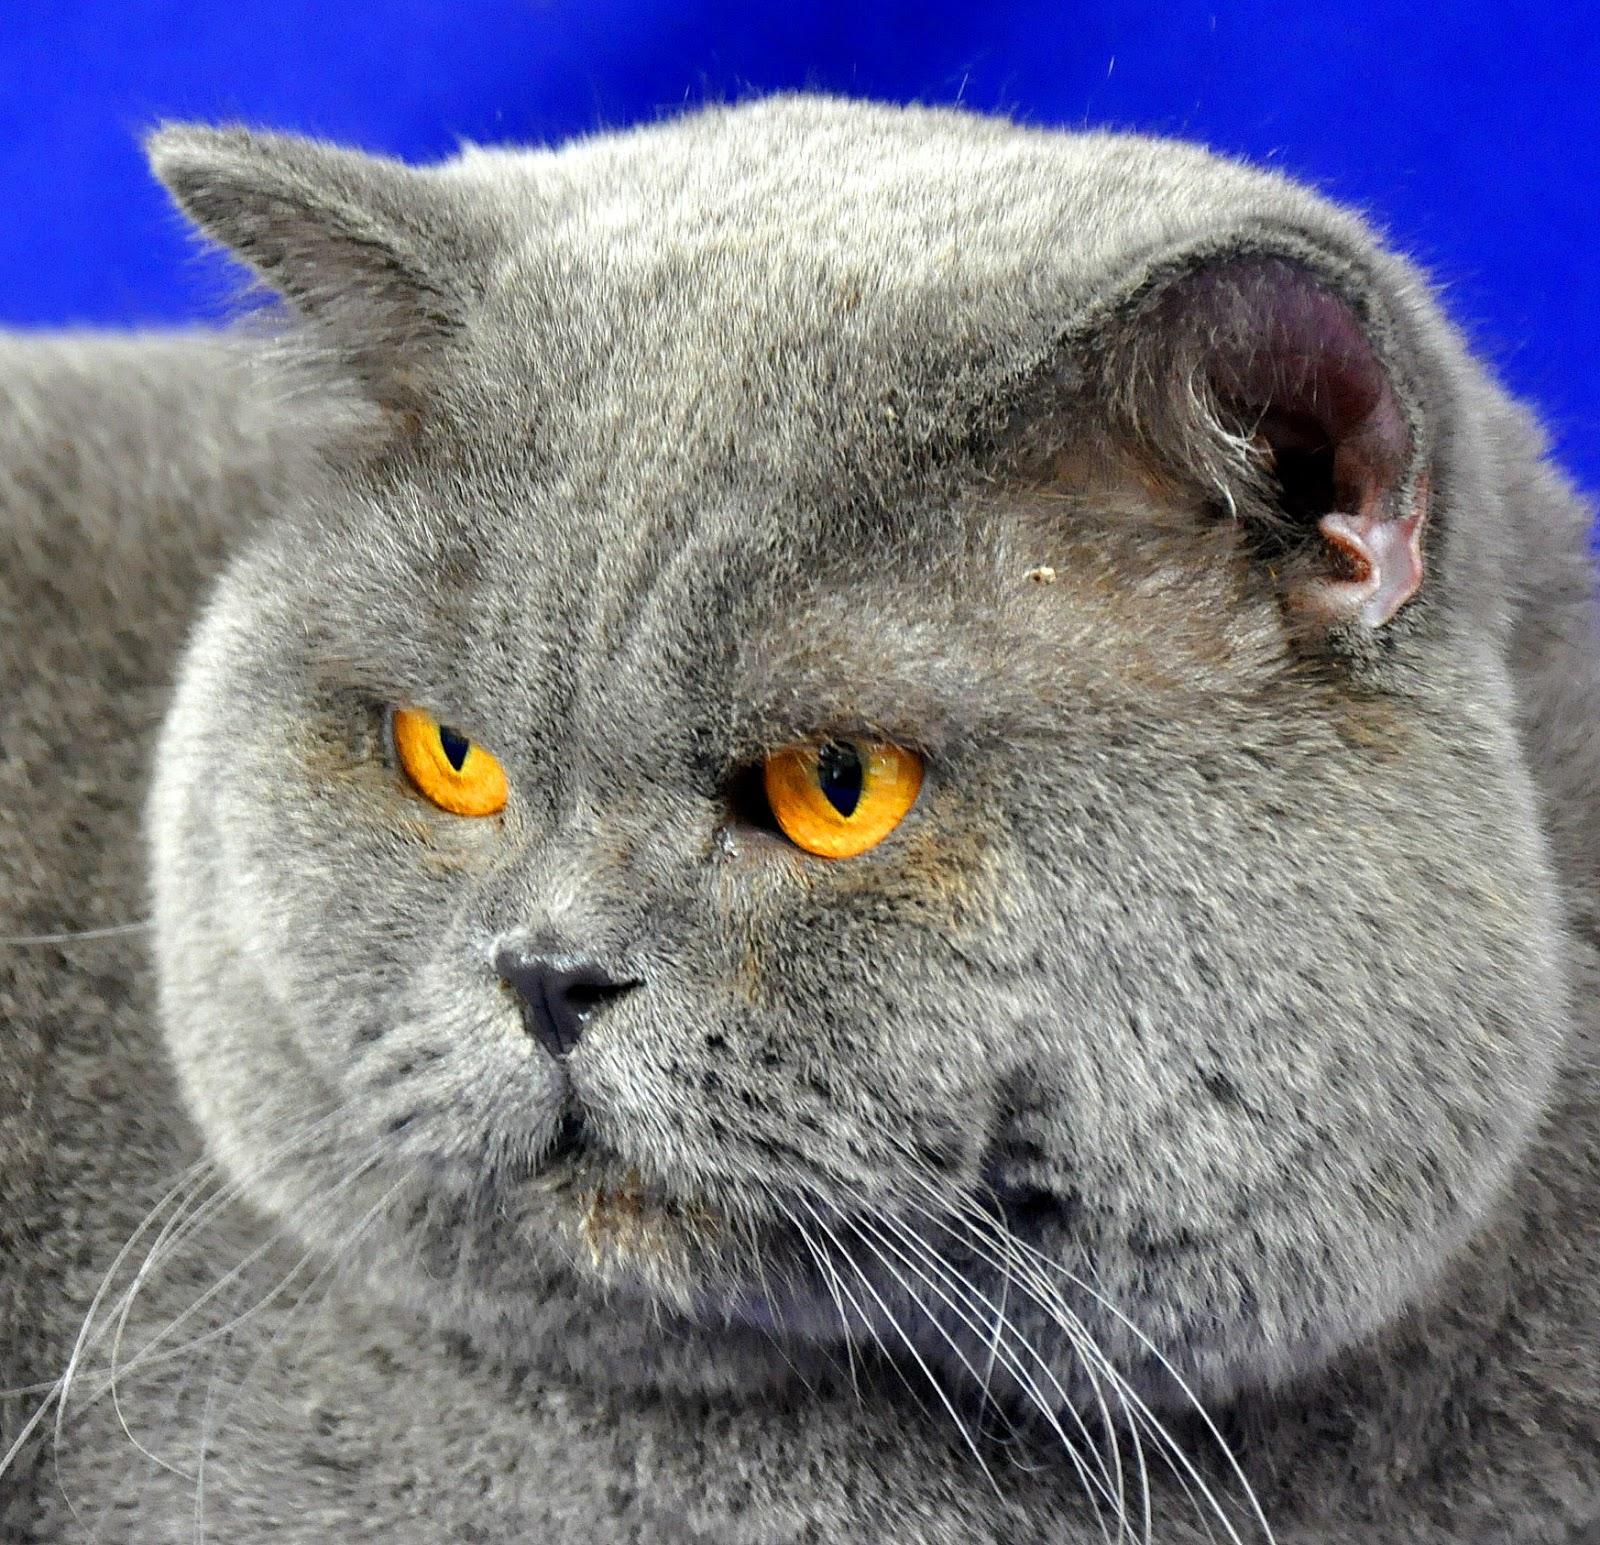 Aneka Kucing Ras Yang Paling Banyak Disukai Info Kucing